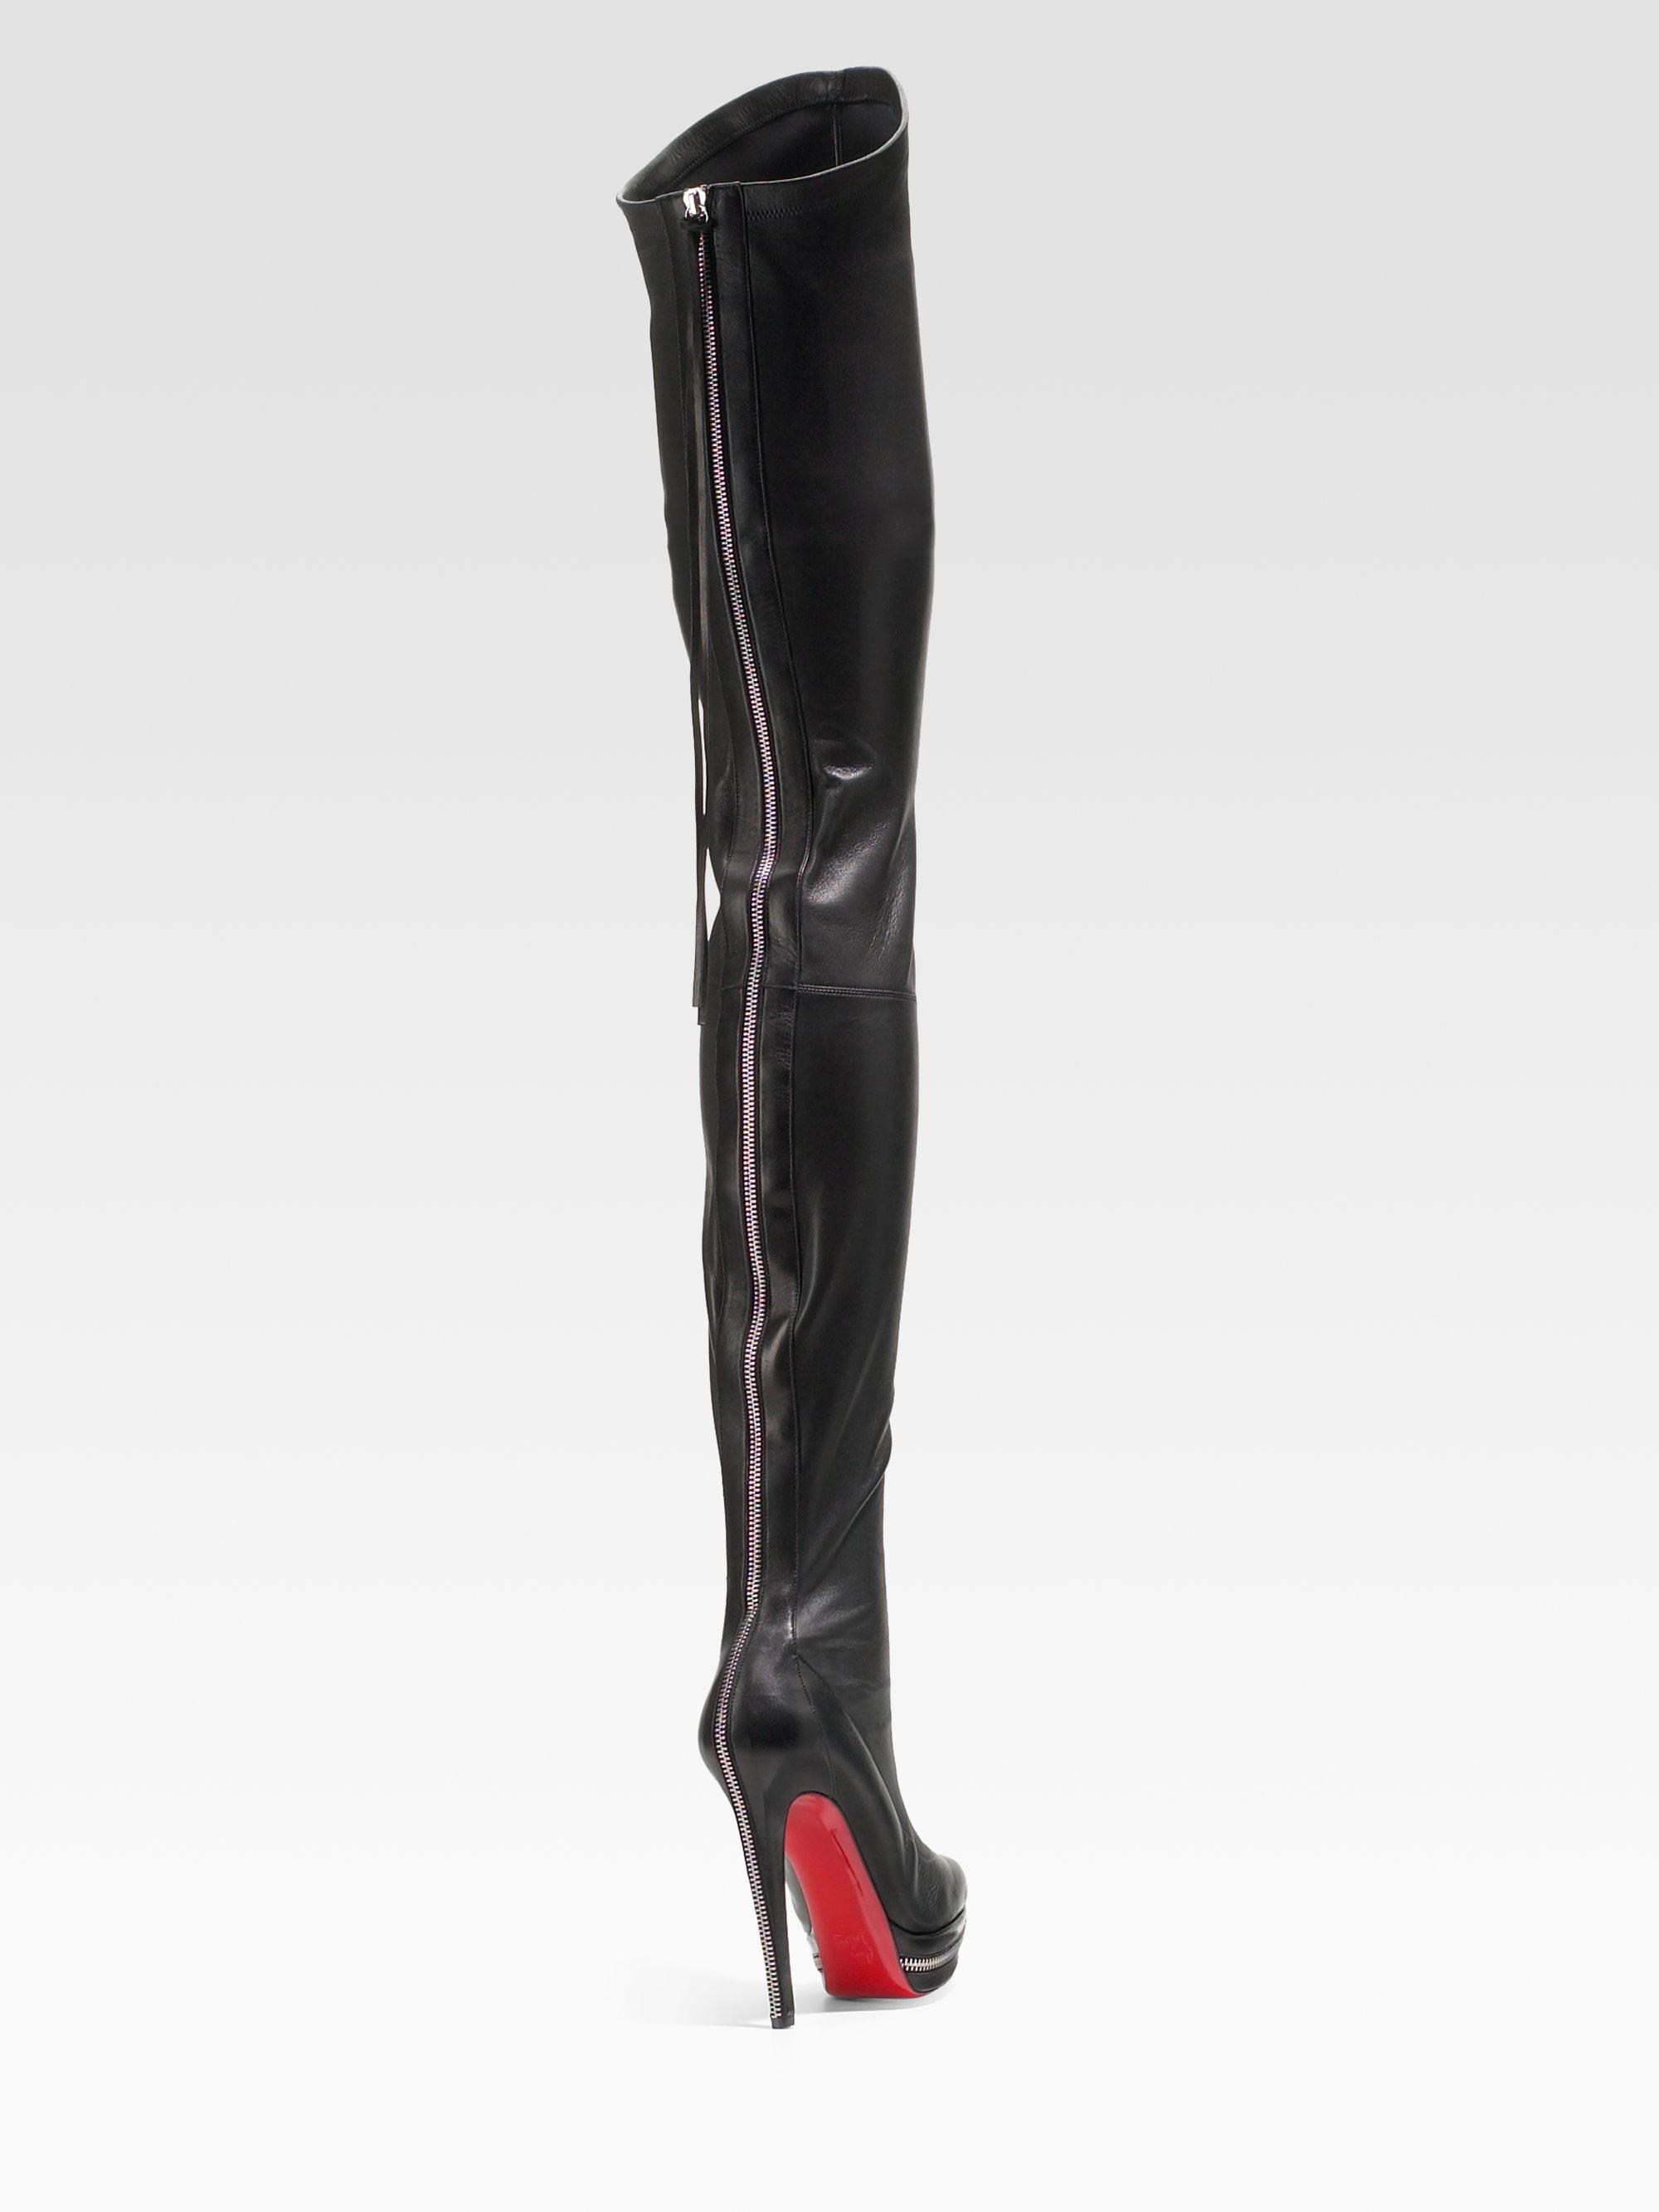 louboutin boots replica uk